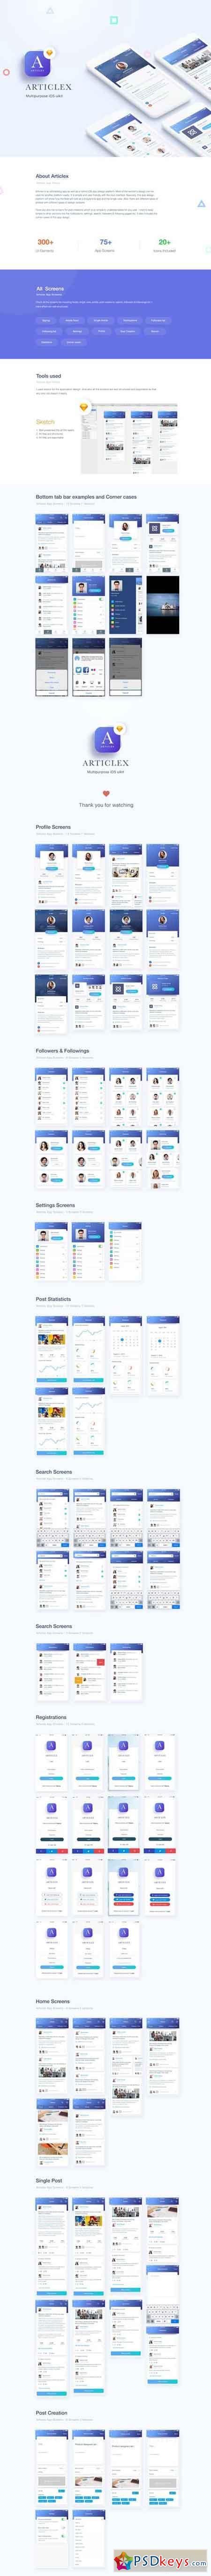 Articlex Multipurpose iOS Ui Kit » Free Download Photoshop